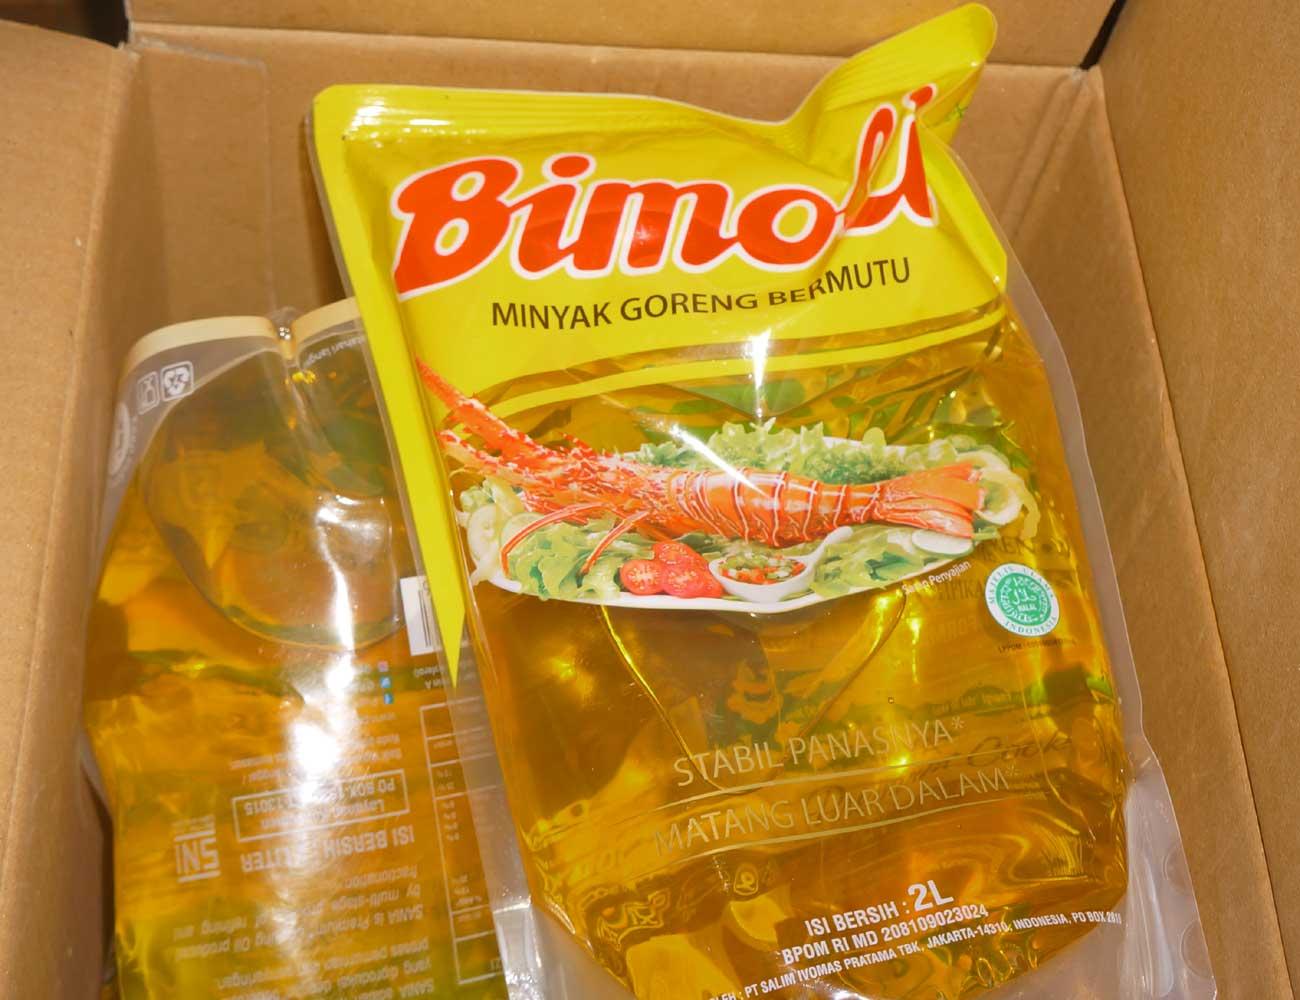 Harga Jual Minyak Goreng Bimoli Special 2 1 Dus Liter Refill Pouch